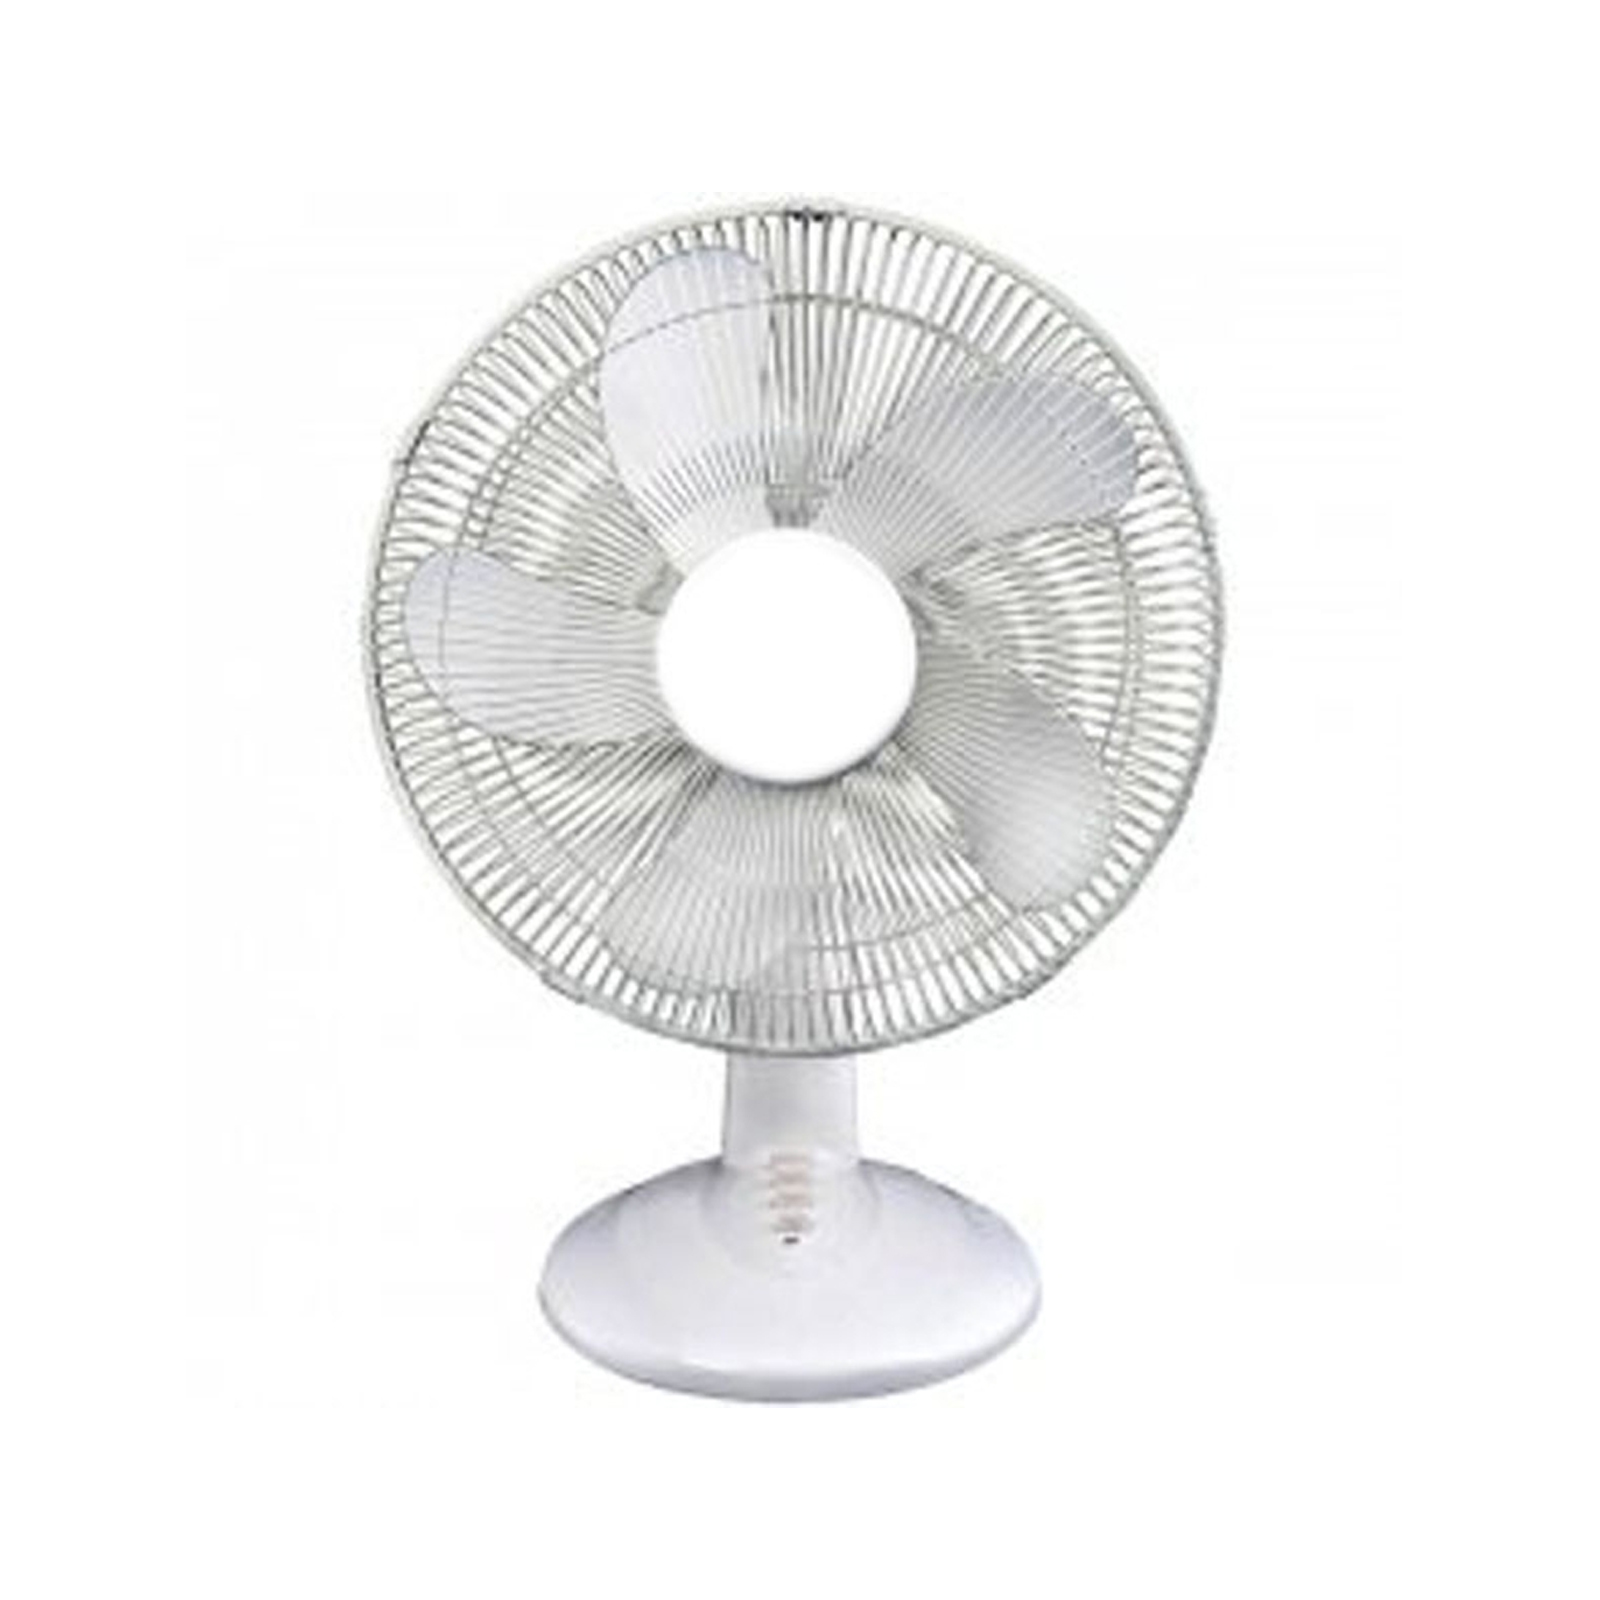 Oscillating Fan Parts : Optimus m quot oscillating table fan